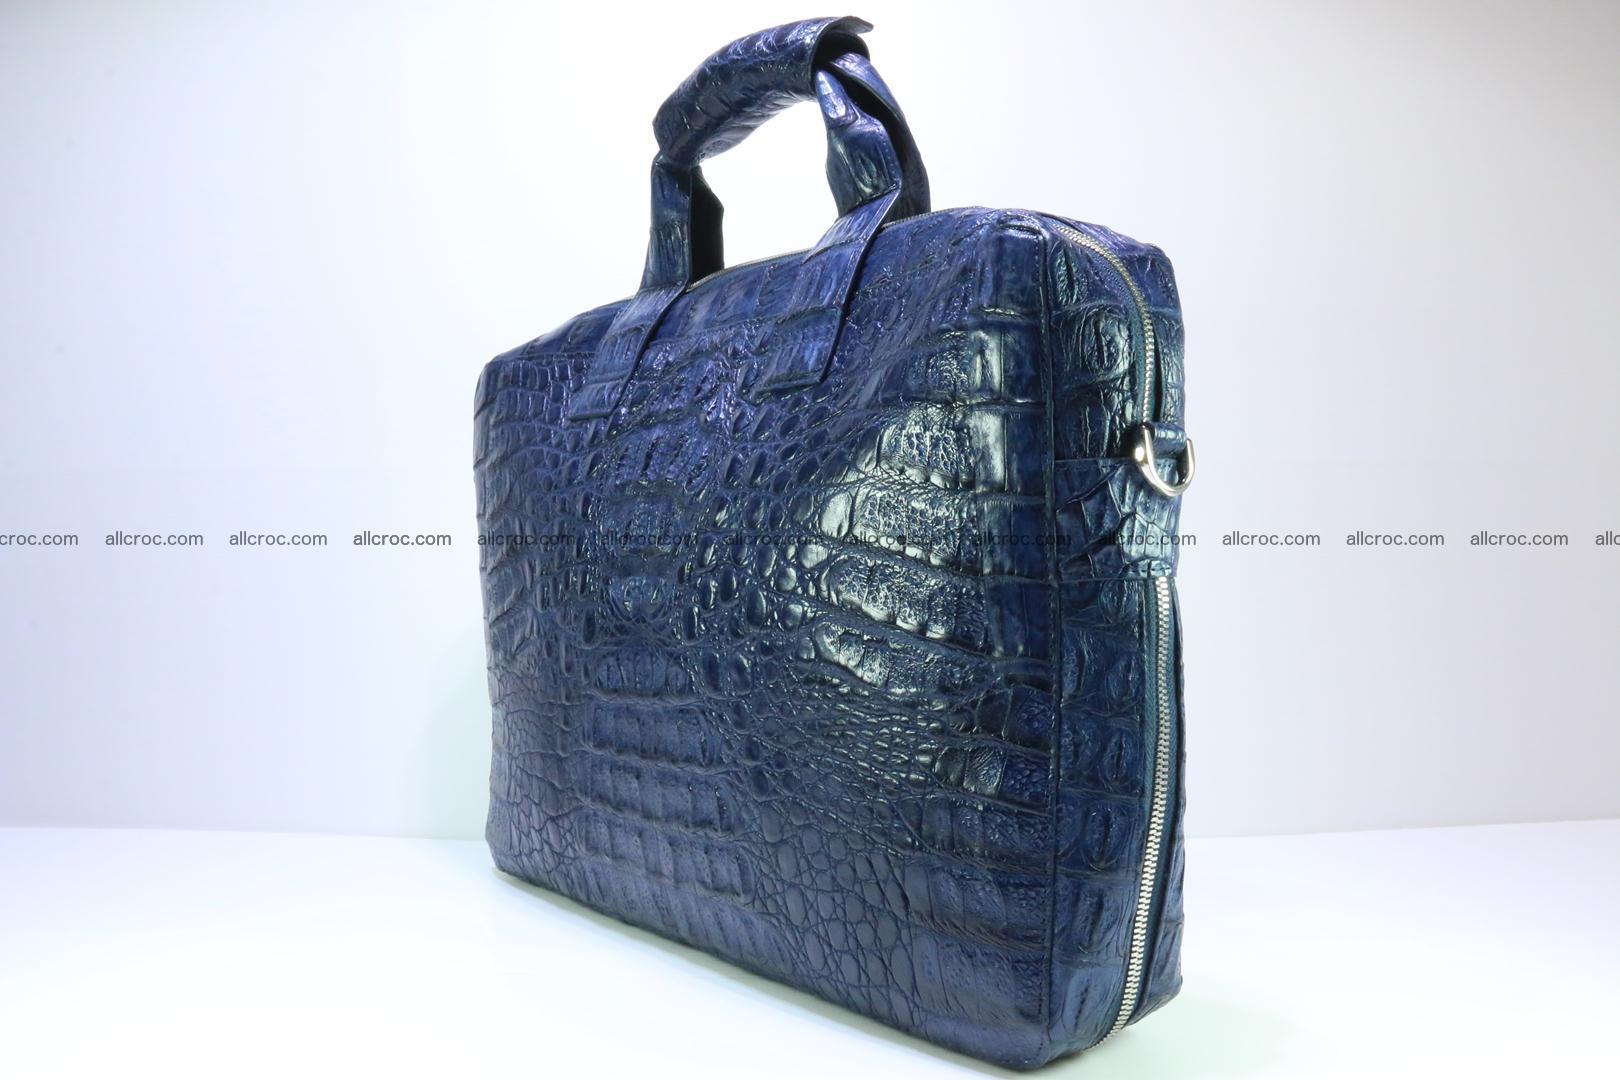 Crocodile skin handbag 423 Foto 2